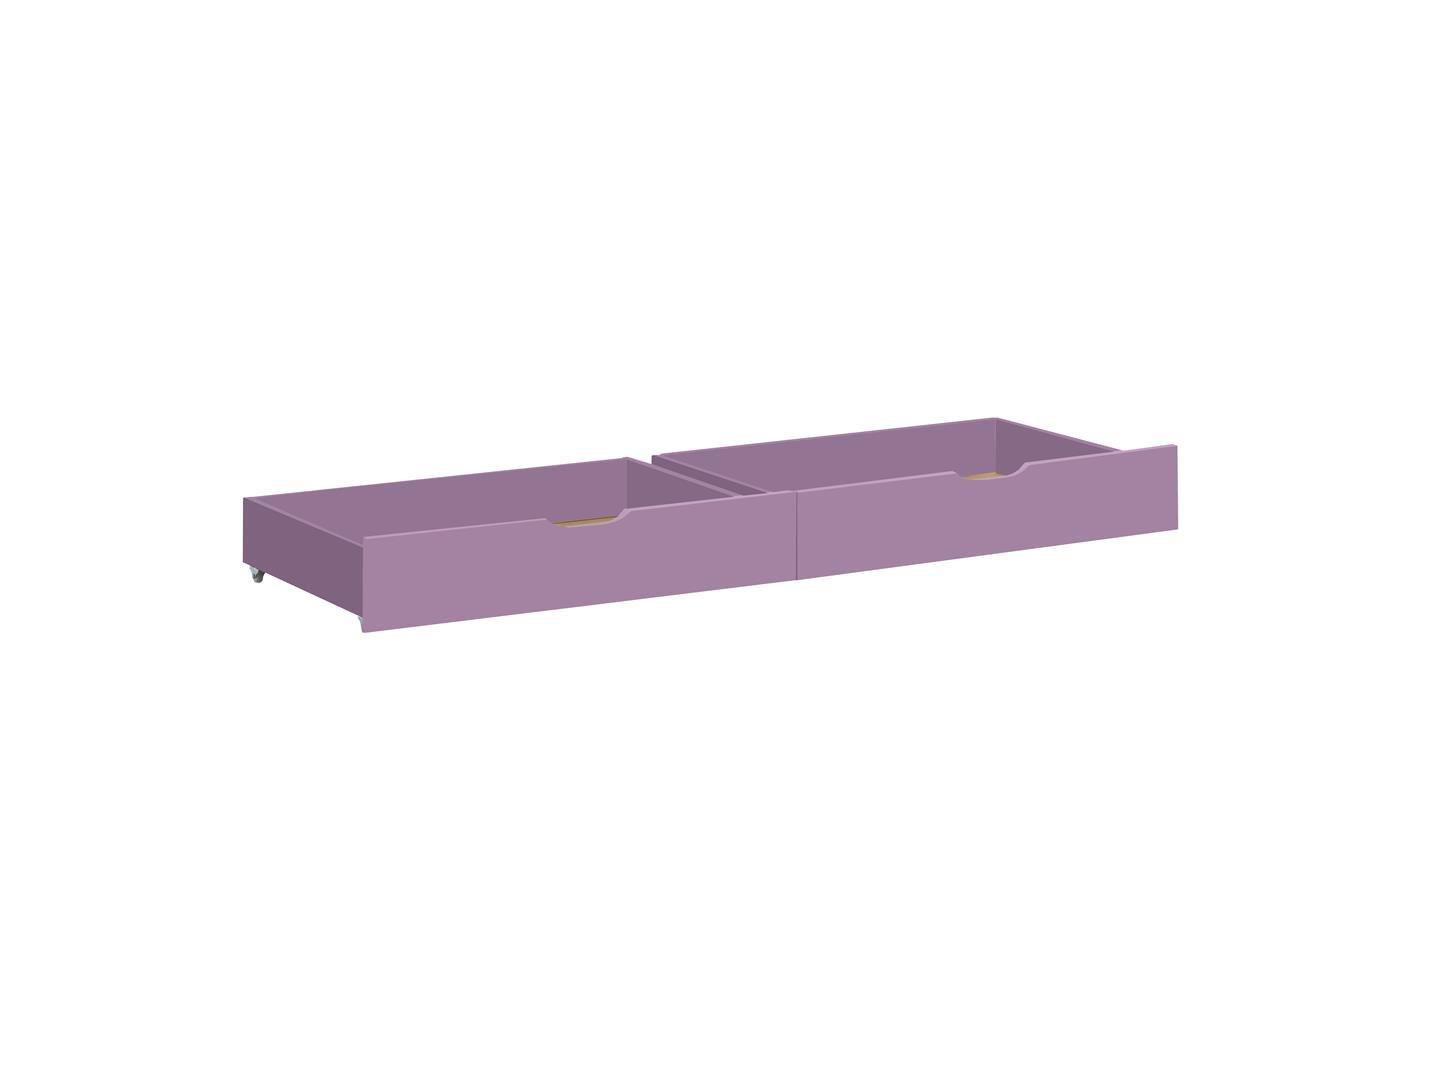 Hoppekids IDA 36-1006-73-07M Drawer Set on Wheels for Junior/Children's/Infant/Toddler Bed, Wood, Lavender, 70 x 160 cm, 2-Piece MARIE 36-1006-73-07M